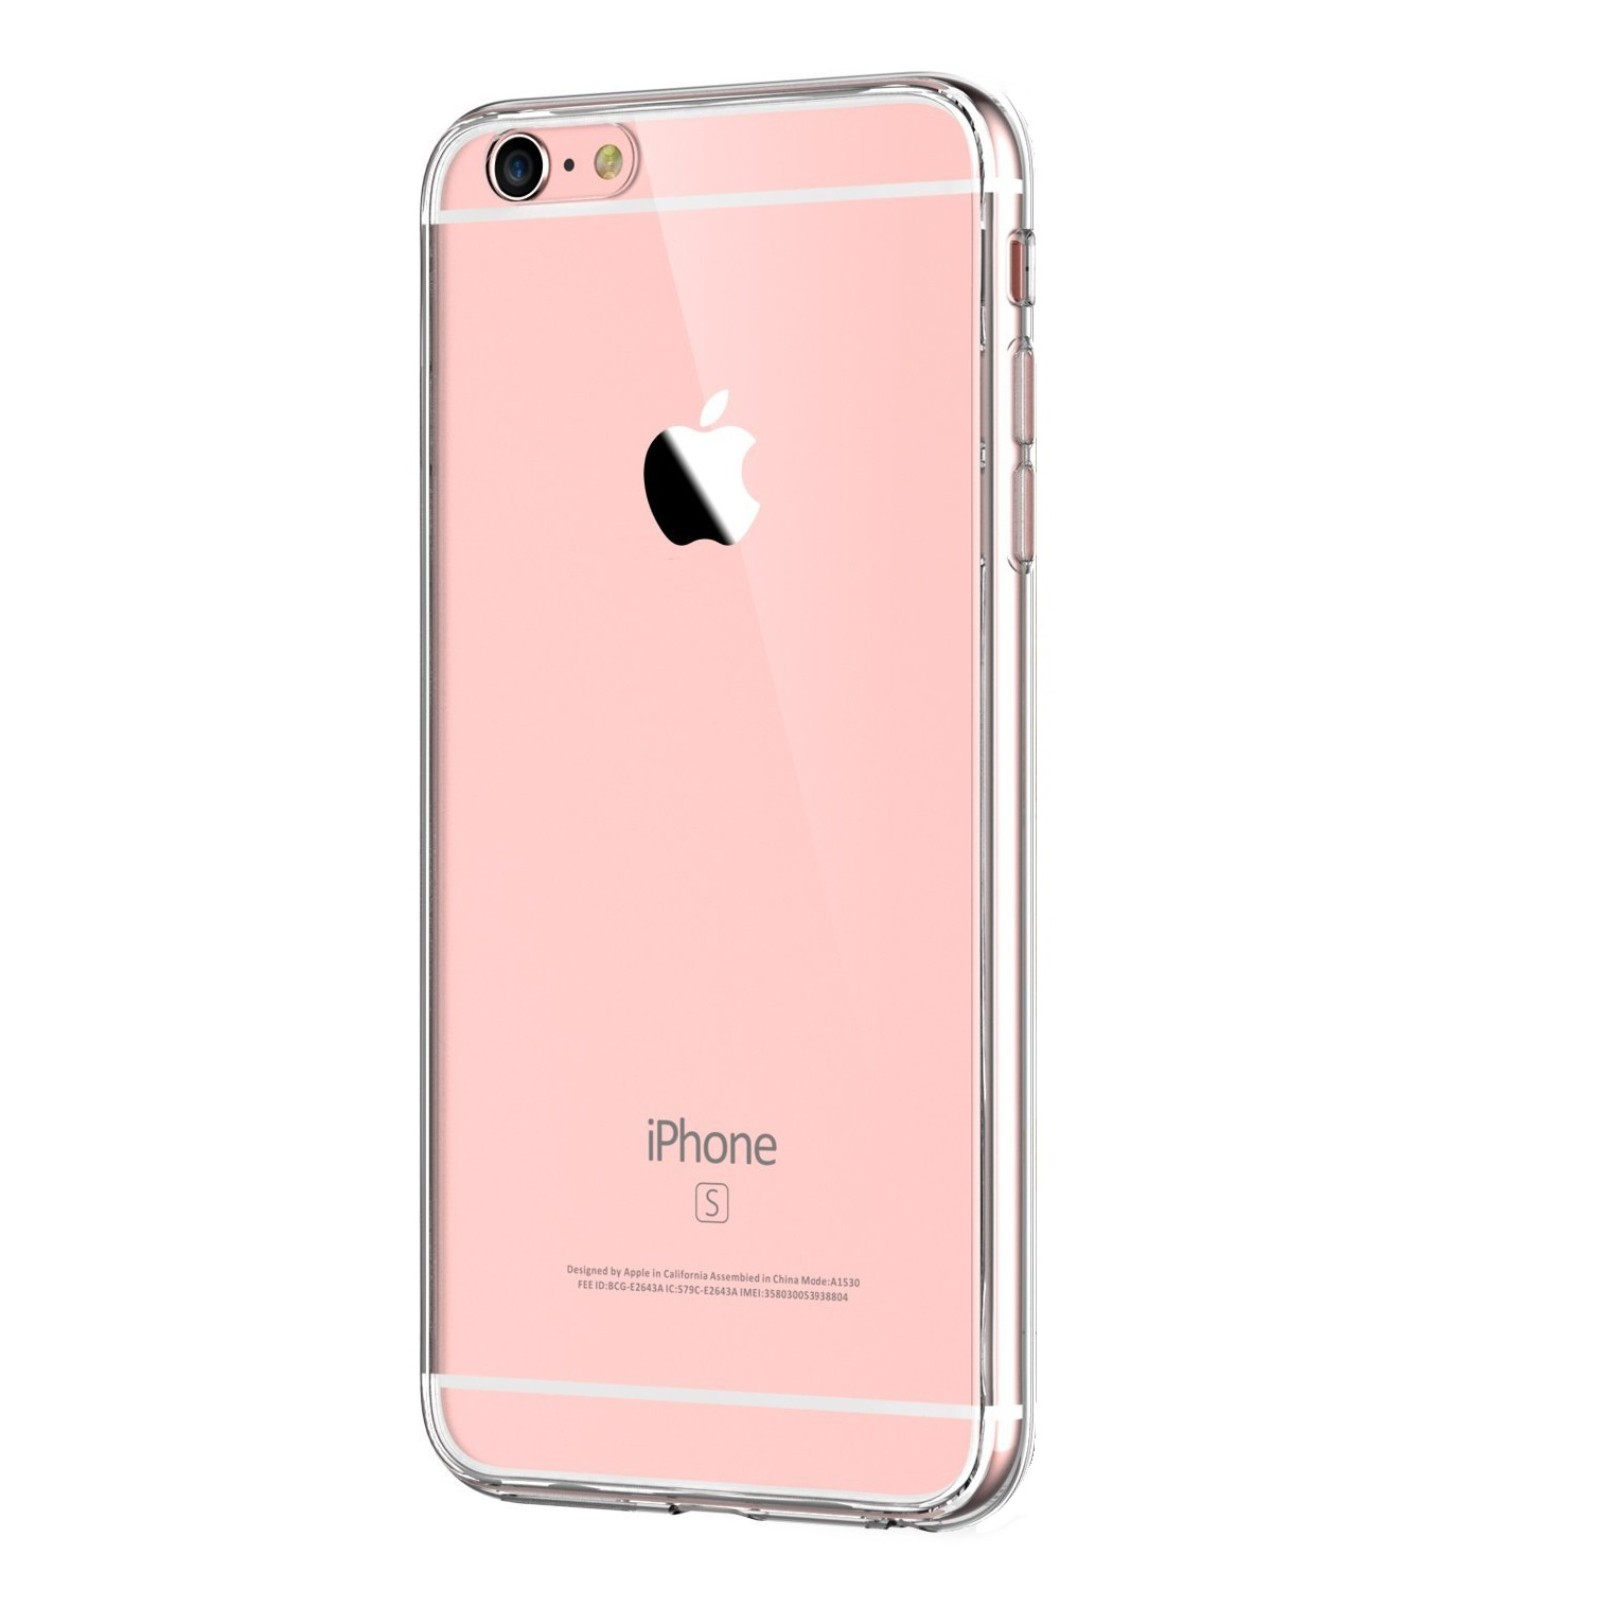 Funda de gel TPU carcasa protectora silicona para Apple Iphone 6 Transparente